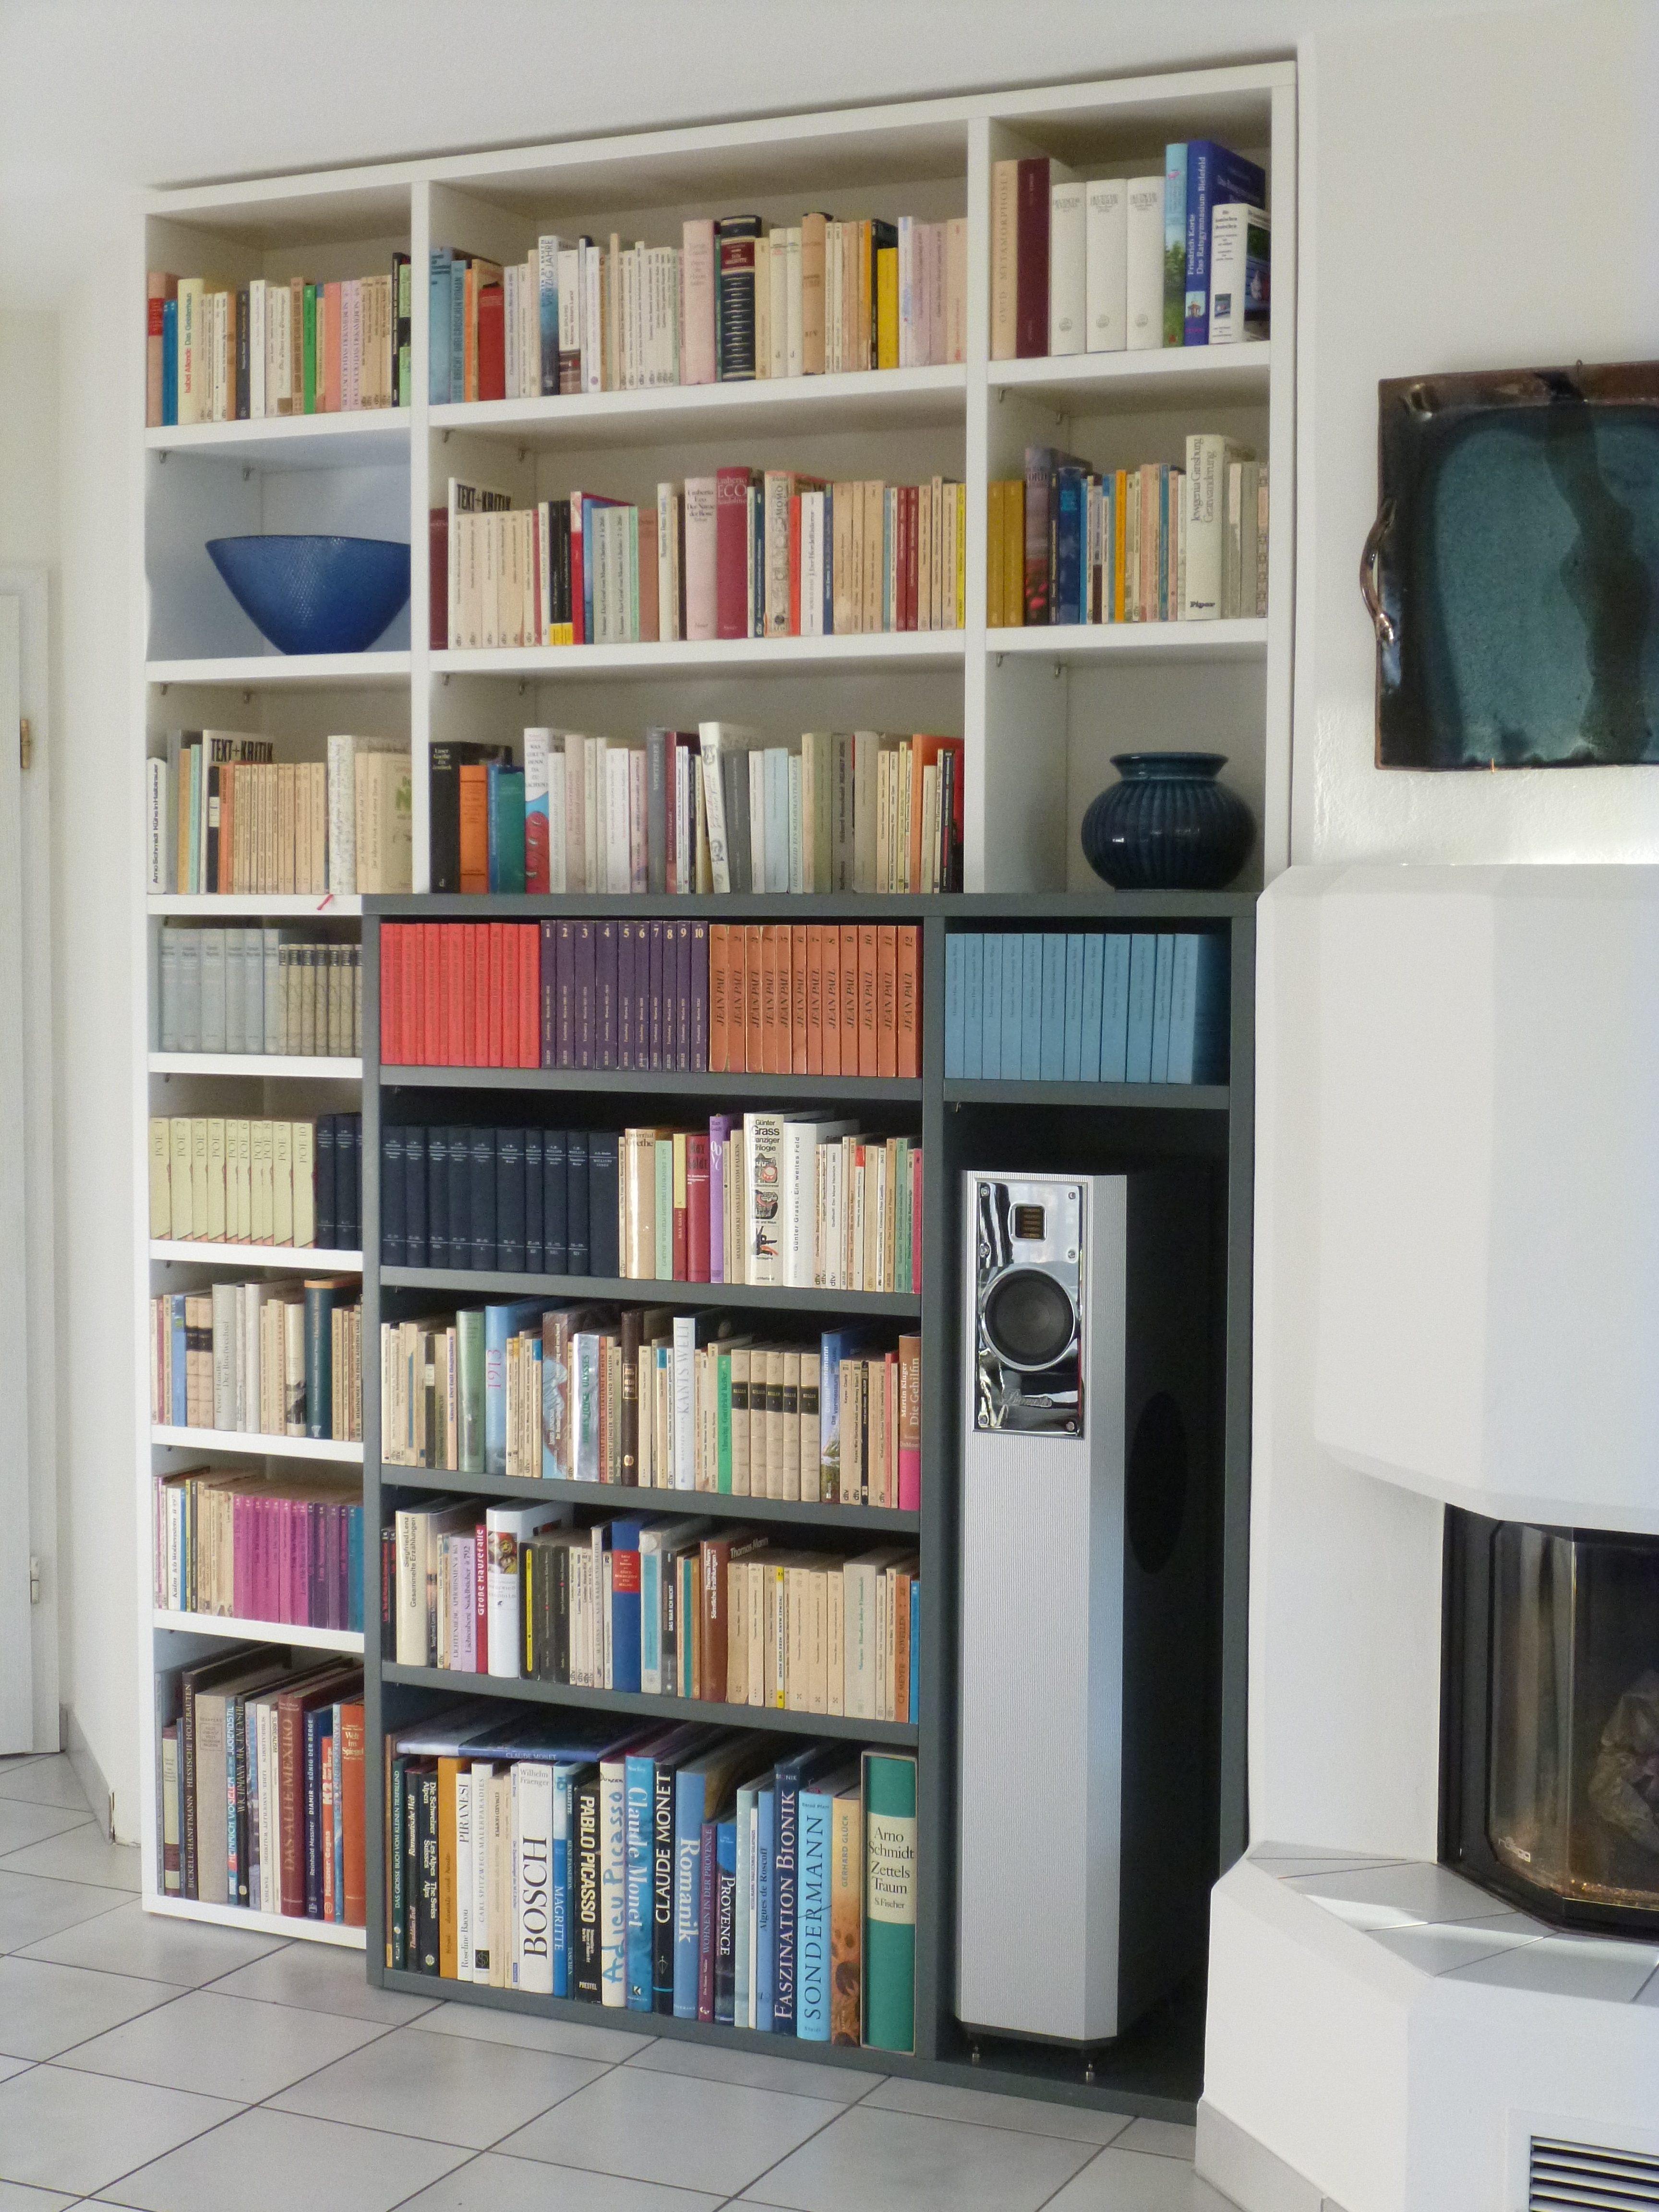 Kamin Bücherregal Einbauschrank 2